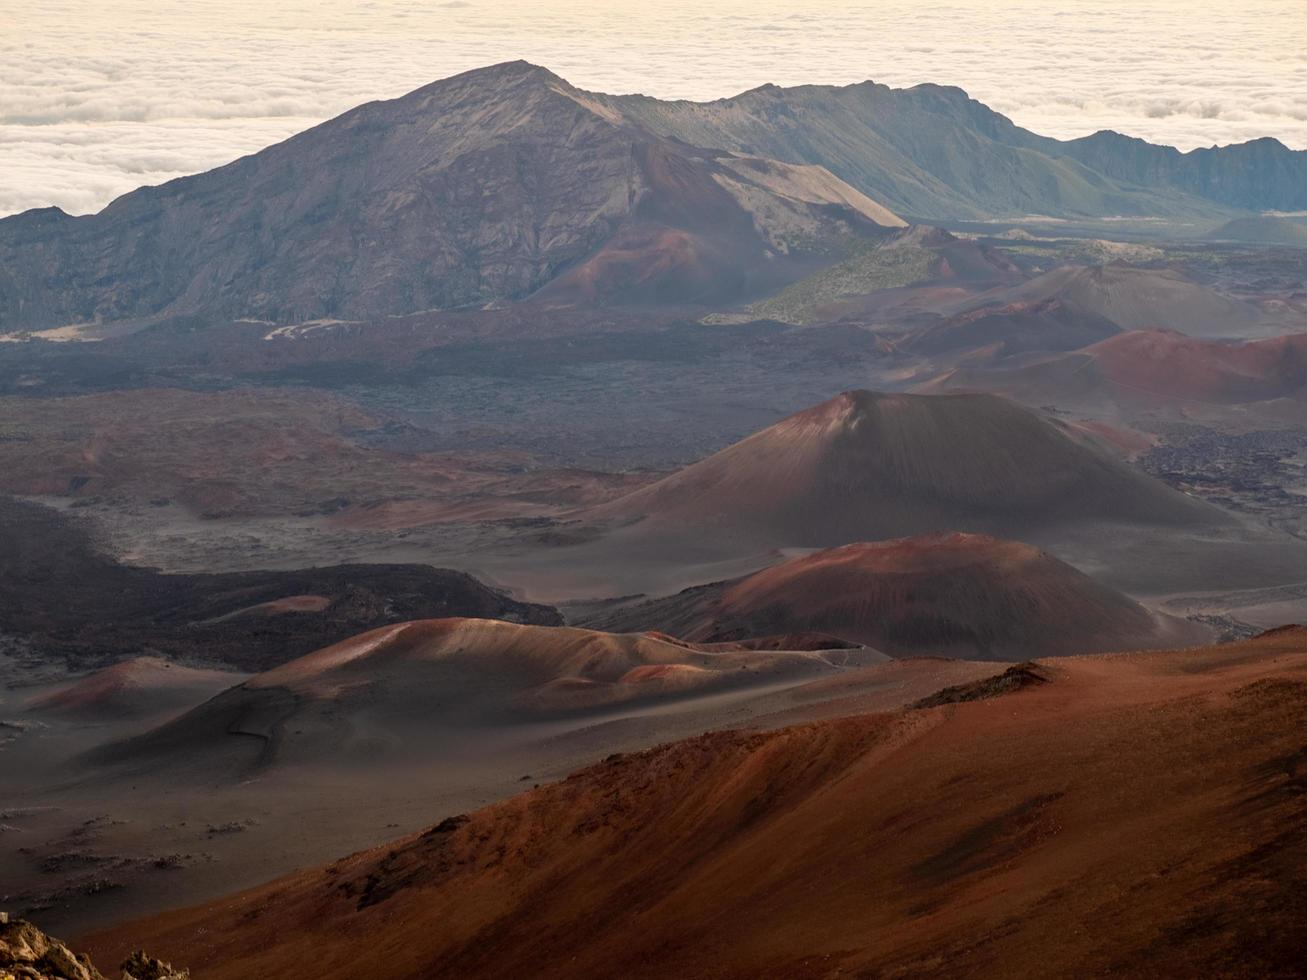 montagne marroni e grigie foto